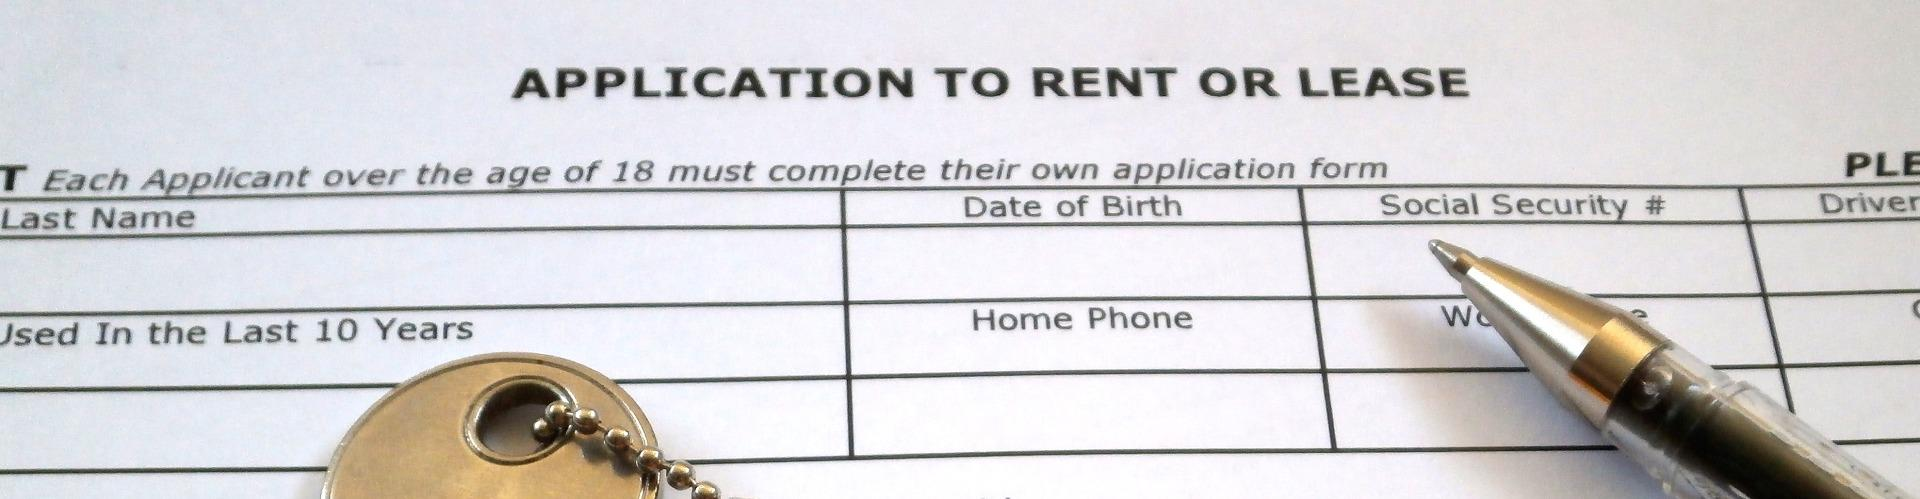 Rental Housing Assistance